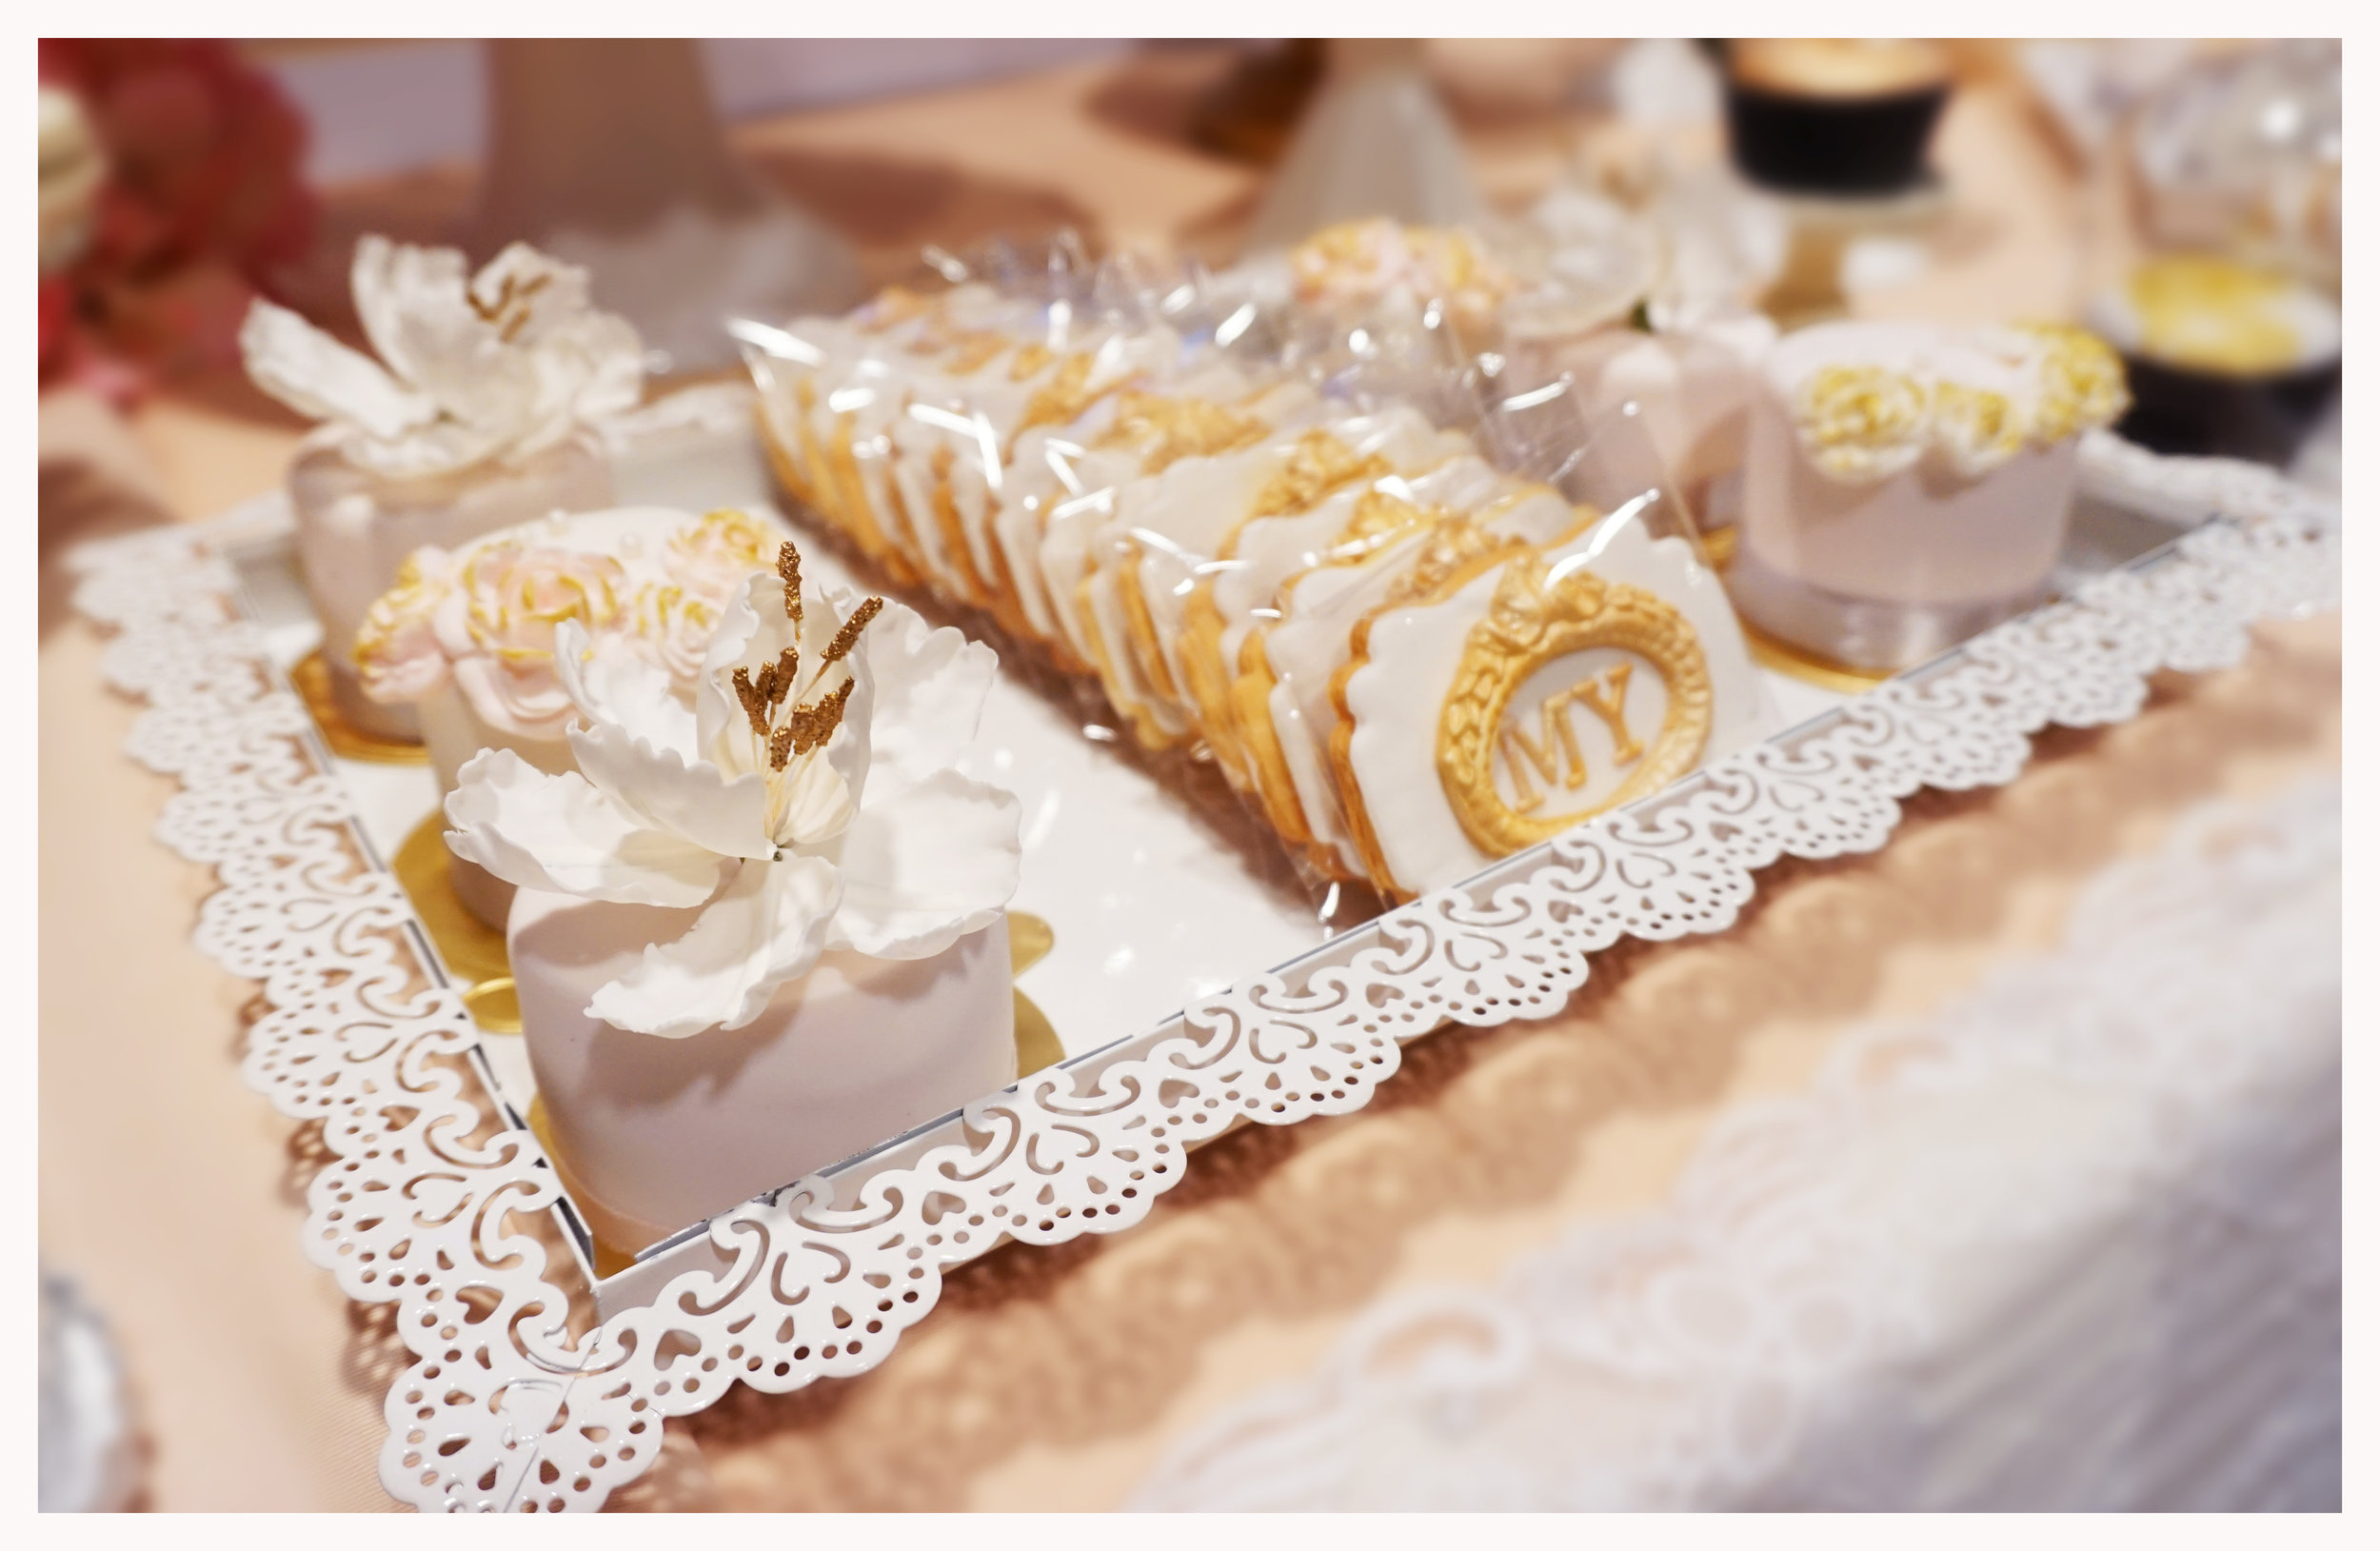 Melody & Yue cookie & mini cake (2).jpg